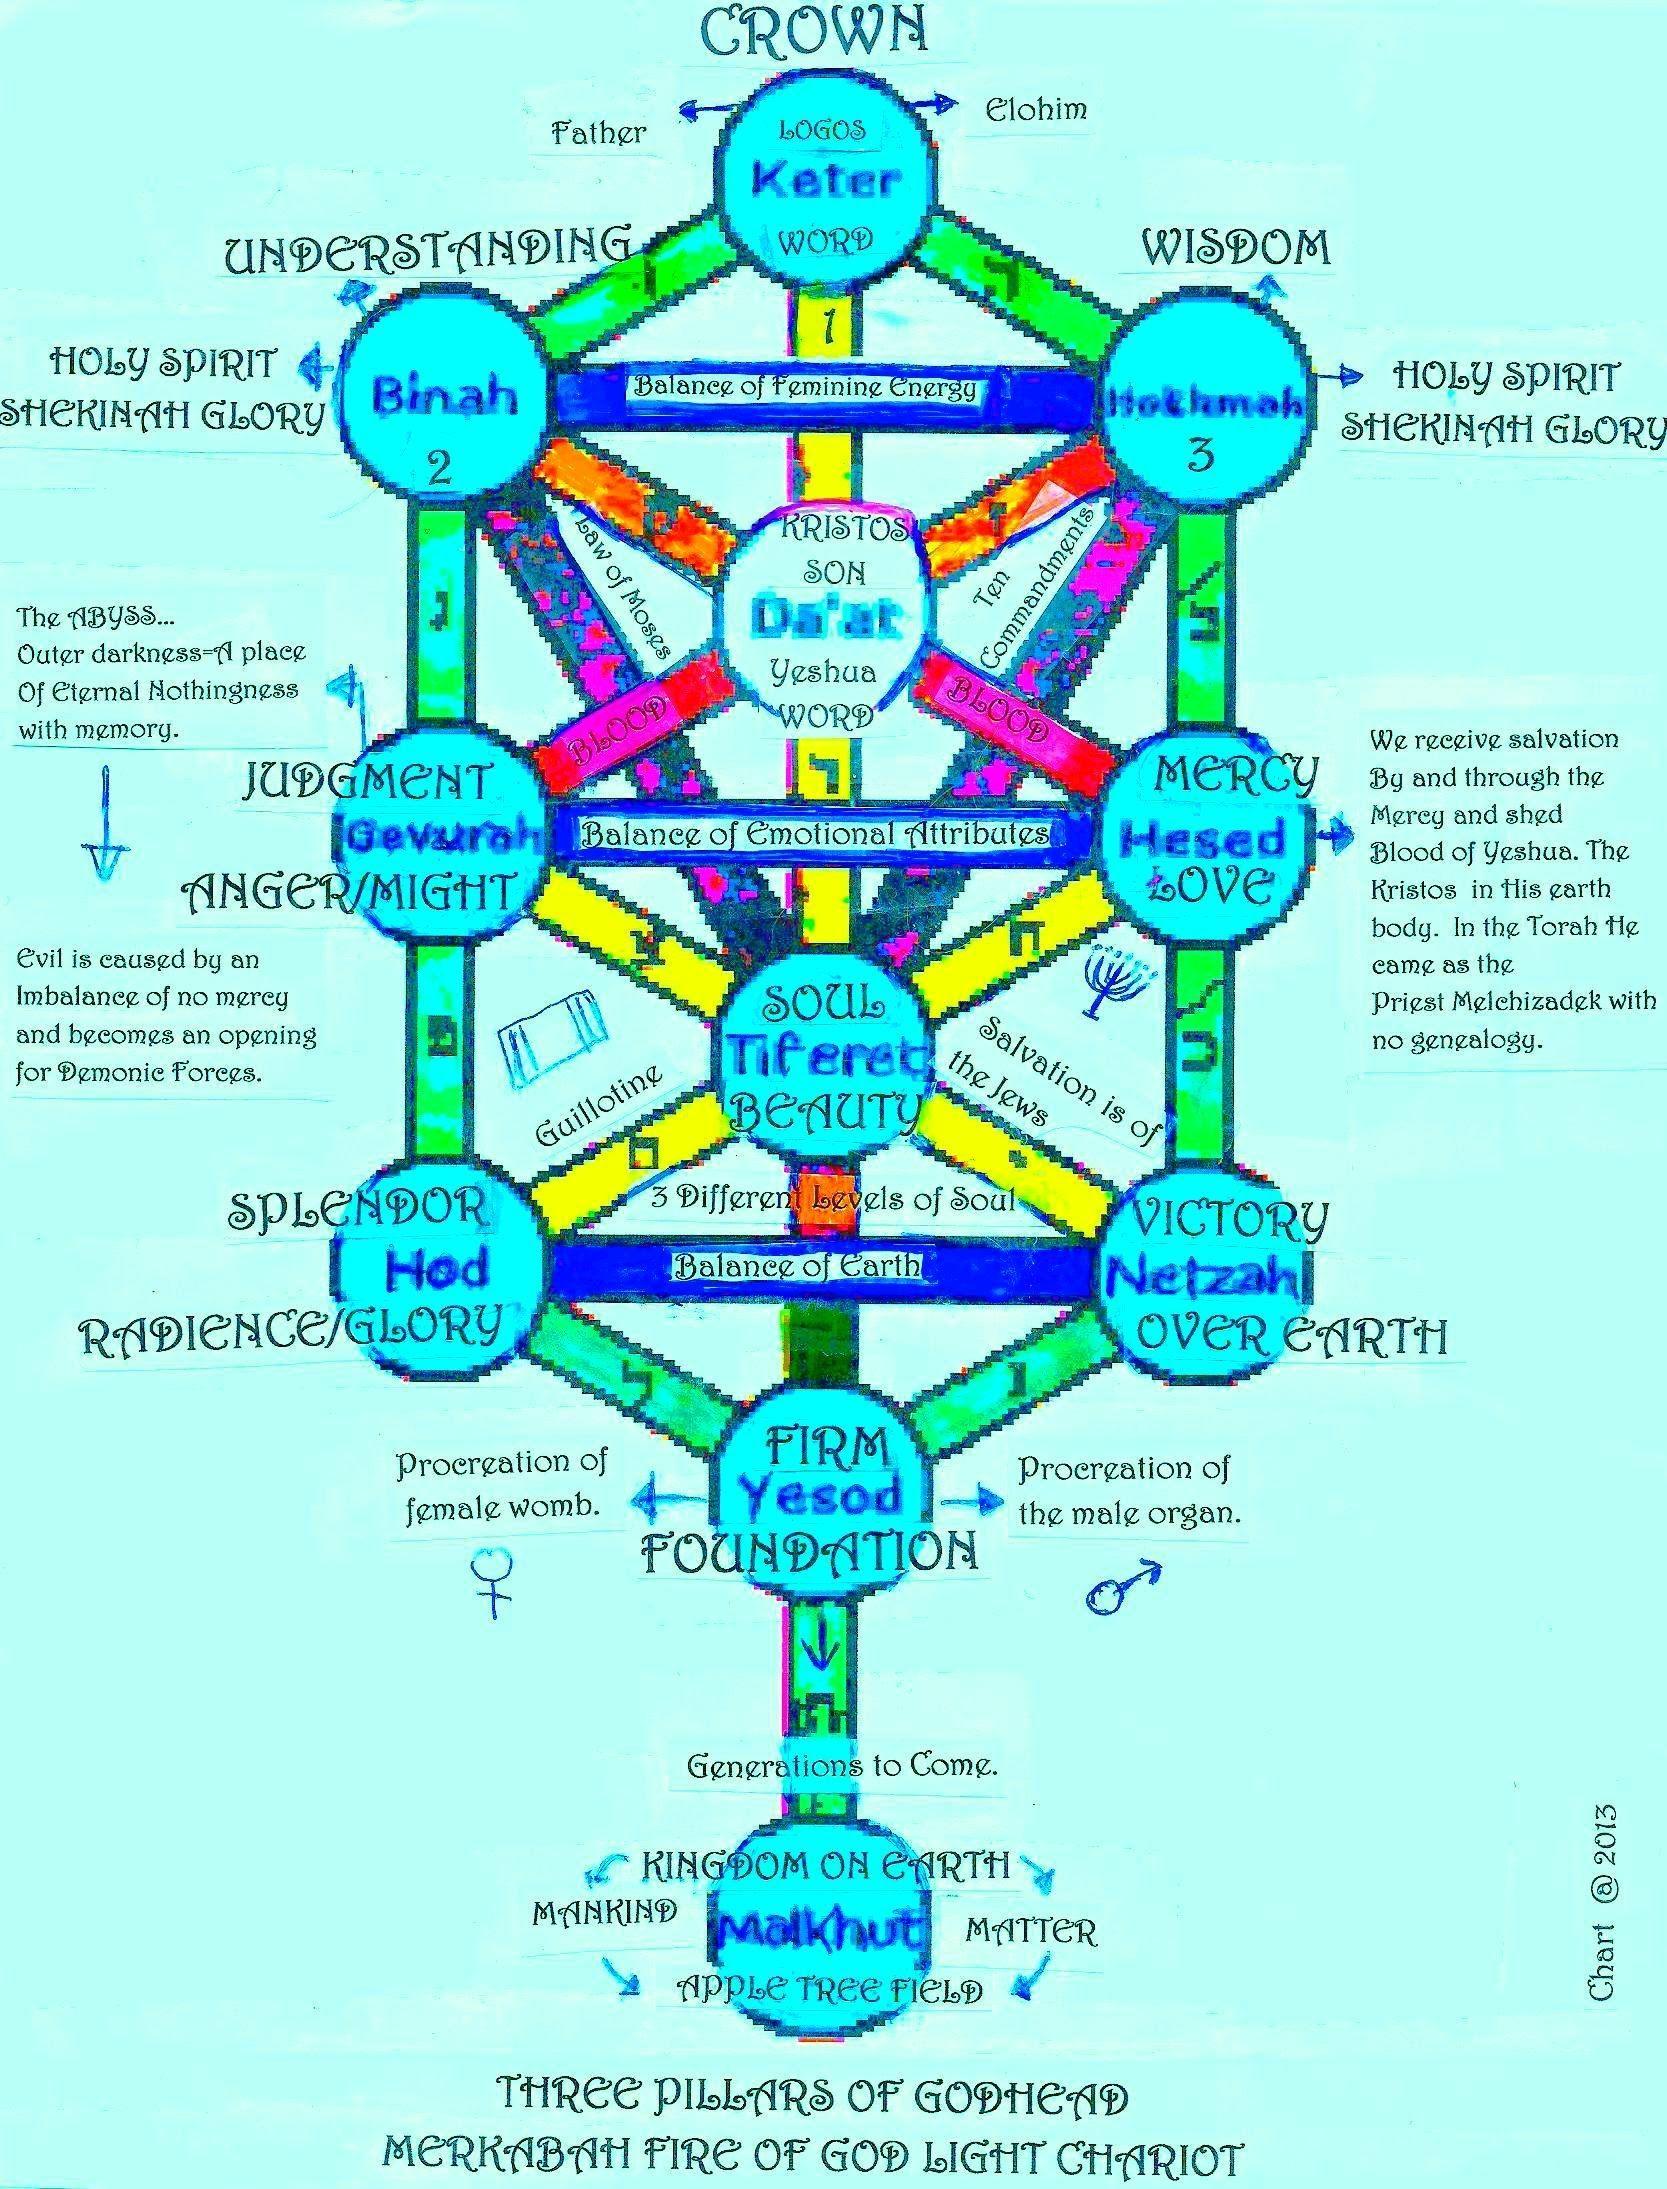 Kabbalah tree of life tree of life kabbalah life